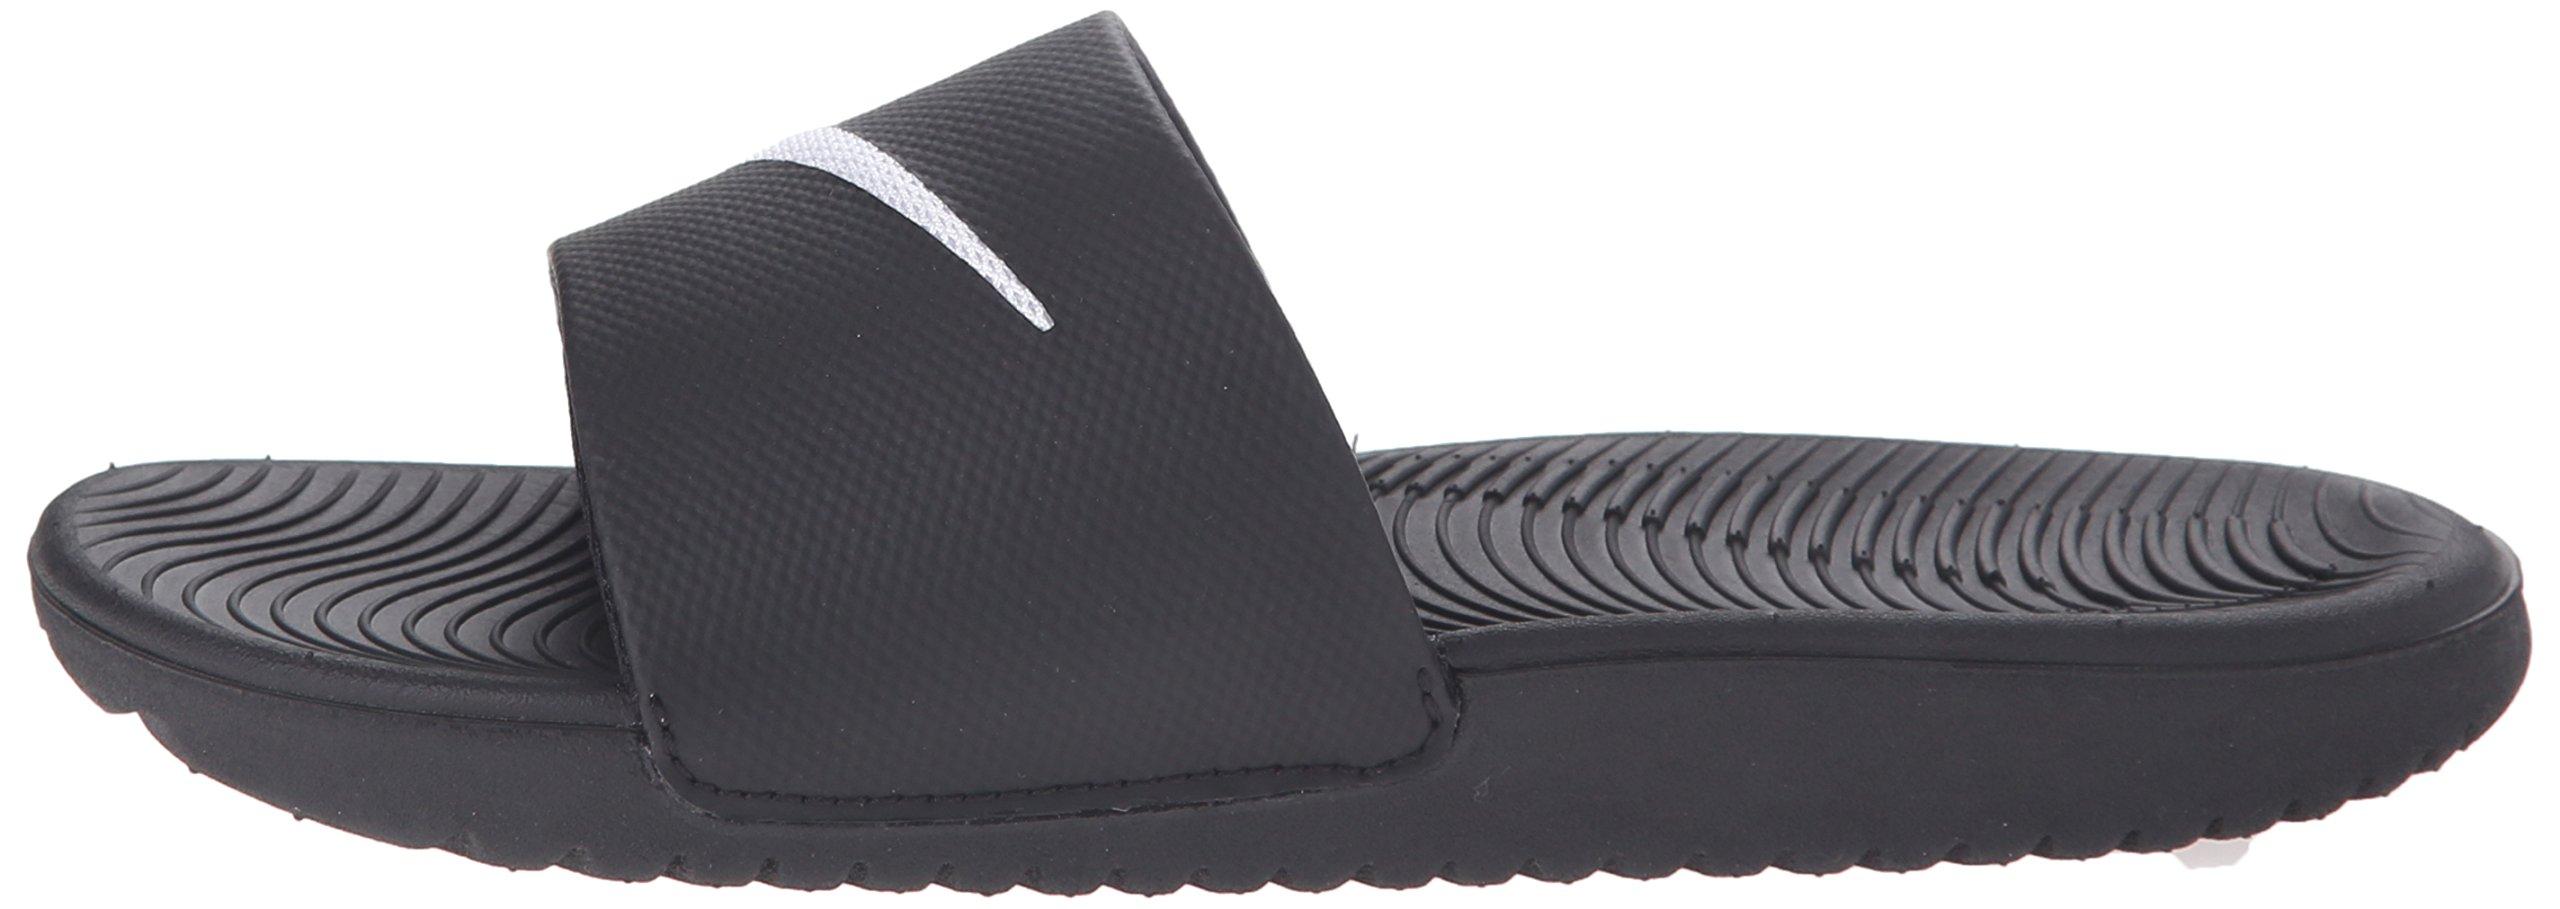 NIKE Kids' Kawa Slide Sandal, Black/White, 4 M US Big Kid by Nike (Image #5)